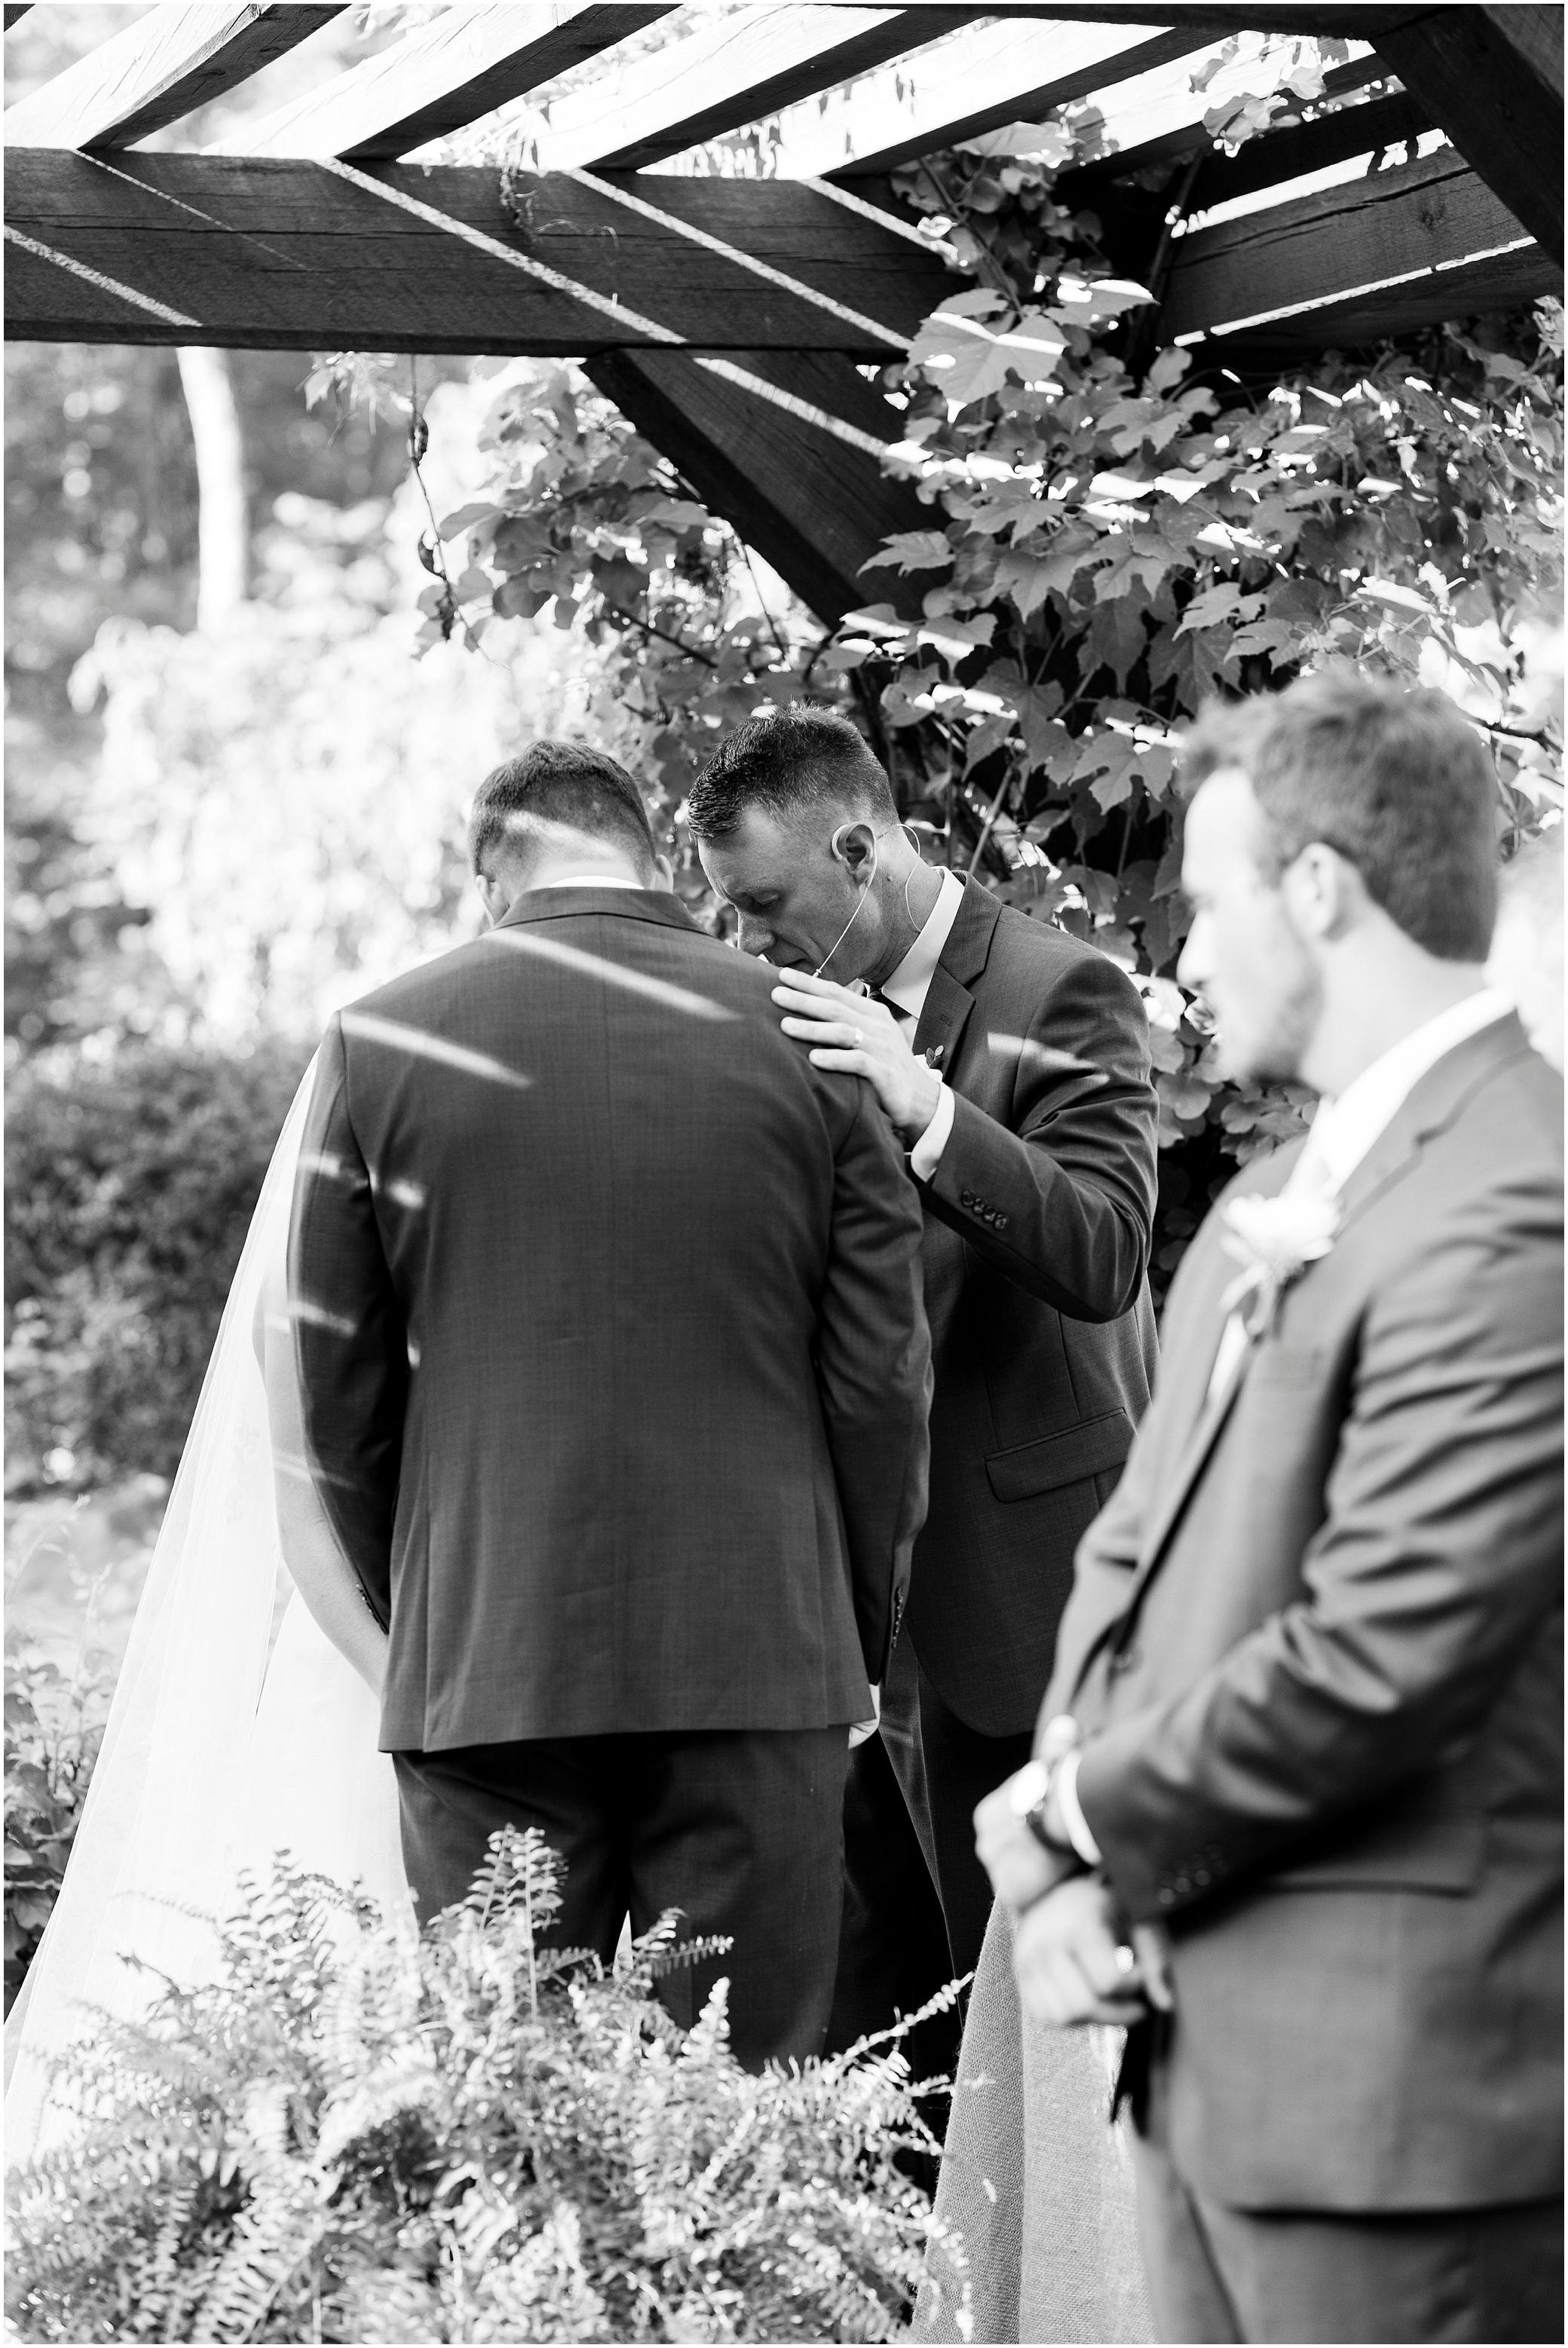 House Mountain Inn Wedding, Virginia wedding in the mountains, wedding ceremony in the mountains